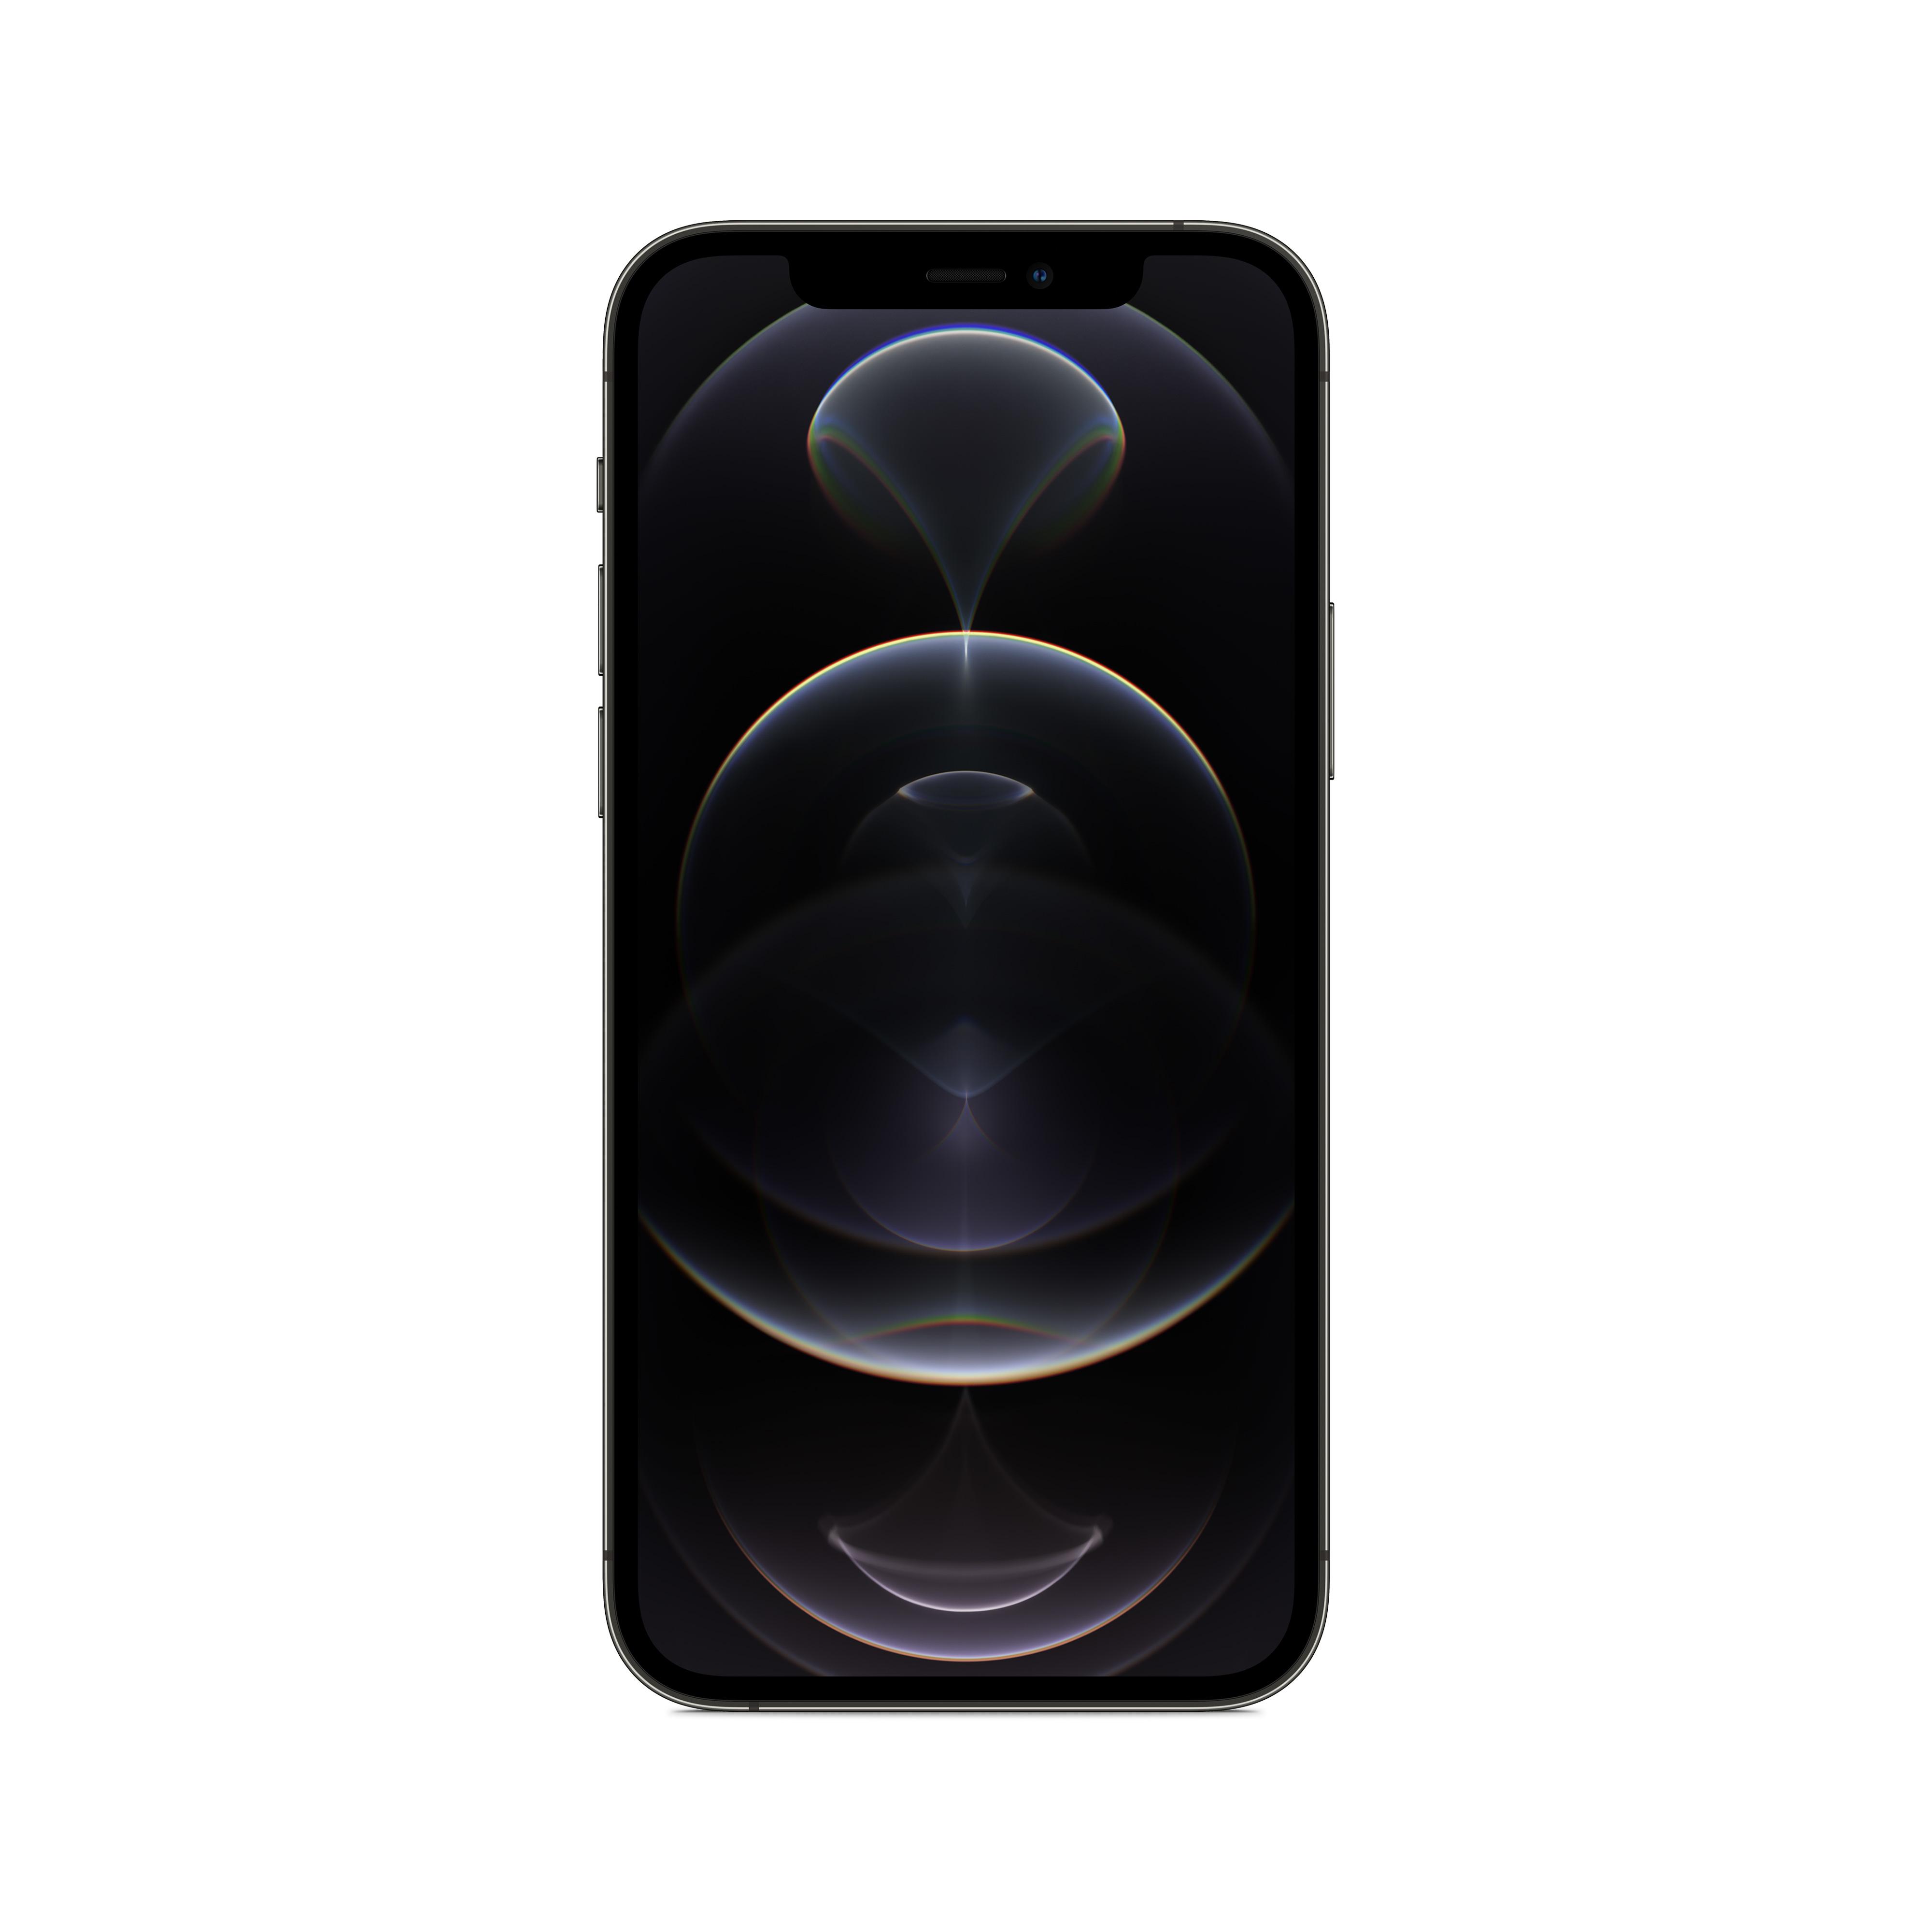 Apple iPhone 12 Pro 128gb Graphite Super Retina XDR